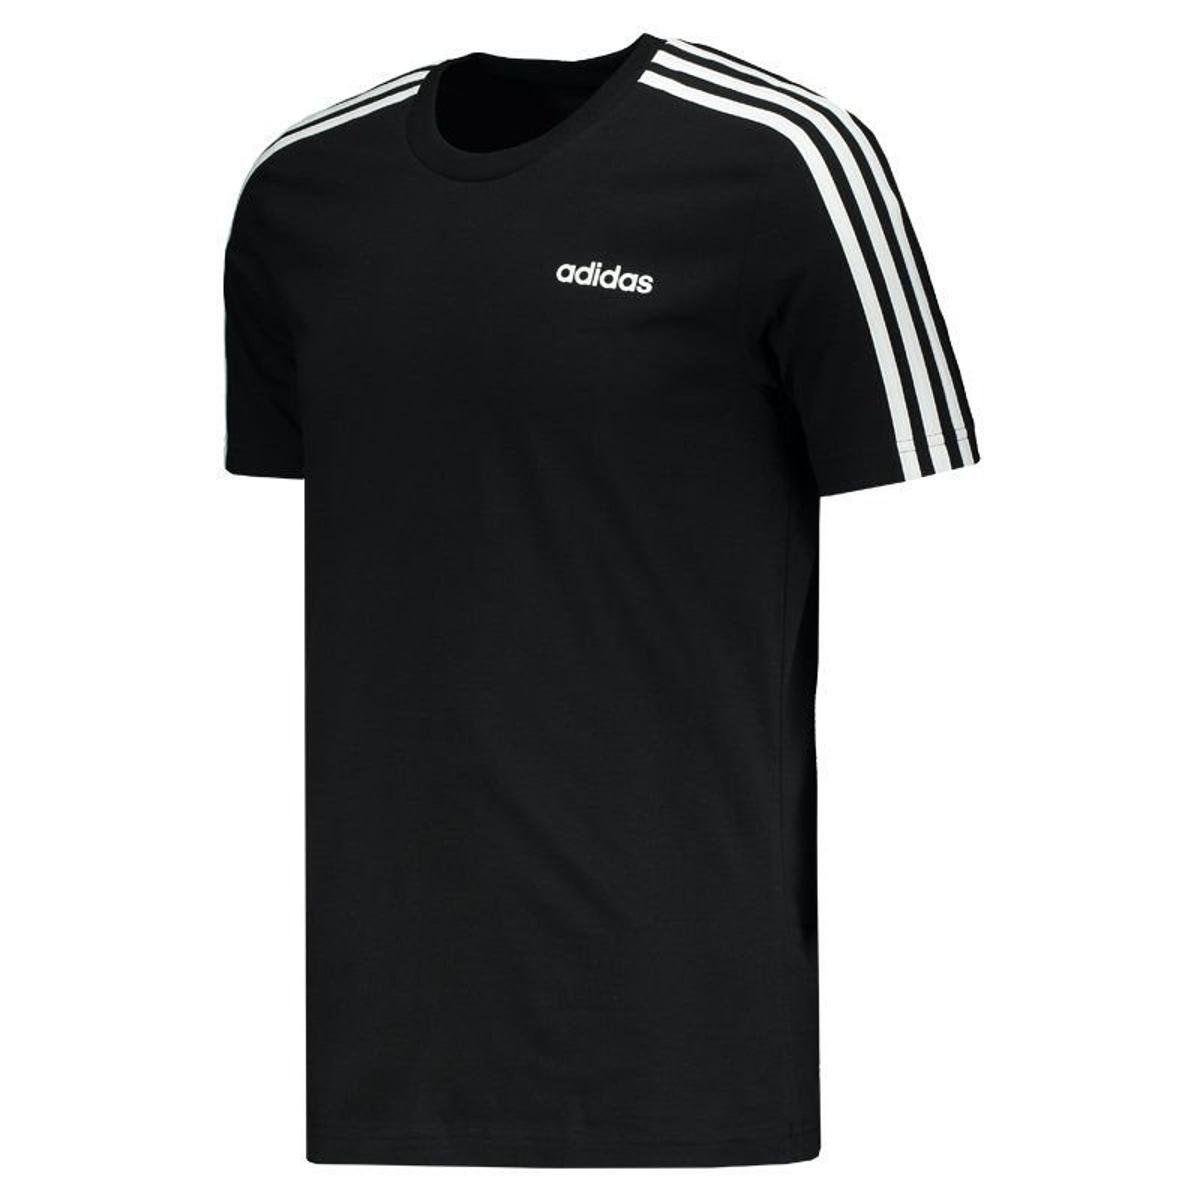 Camiseta Masculina Adidas 3S Tee